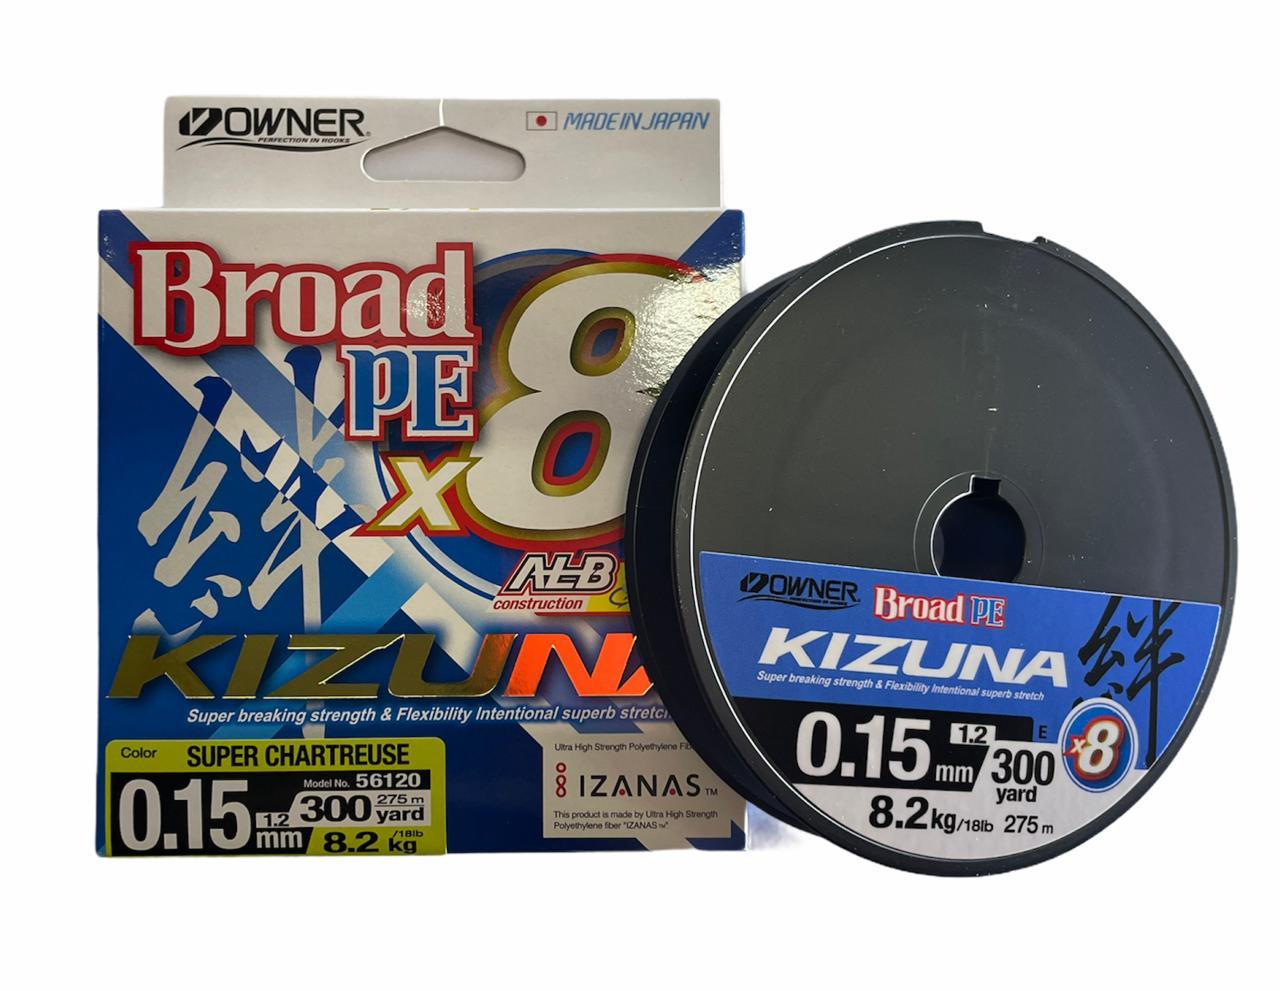 Owner kizuna Broad PE X8 0.15 8.2kg 275m (amarillo)